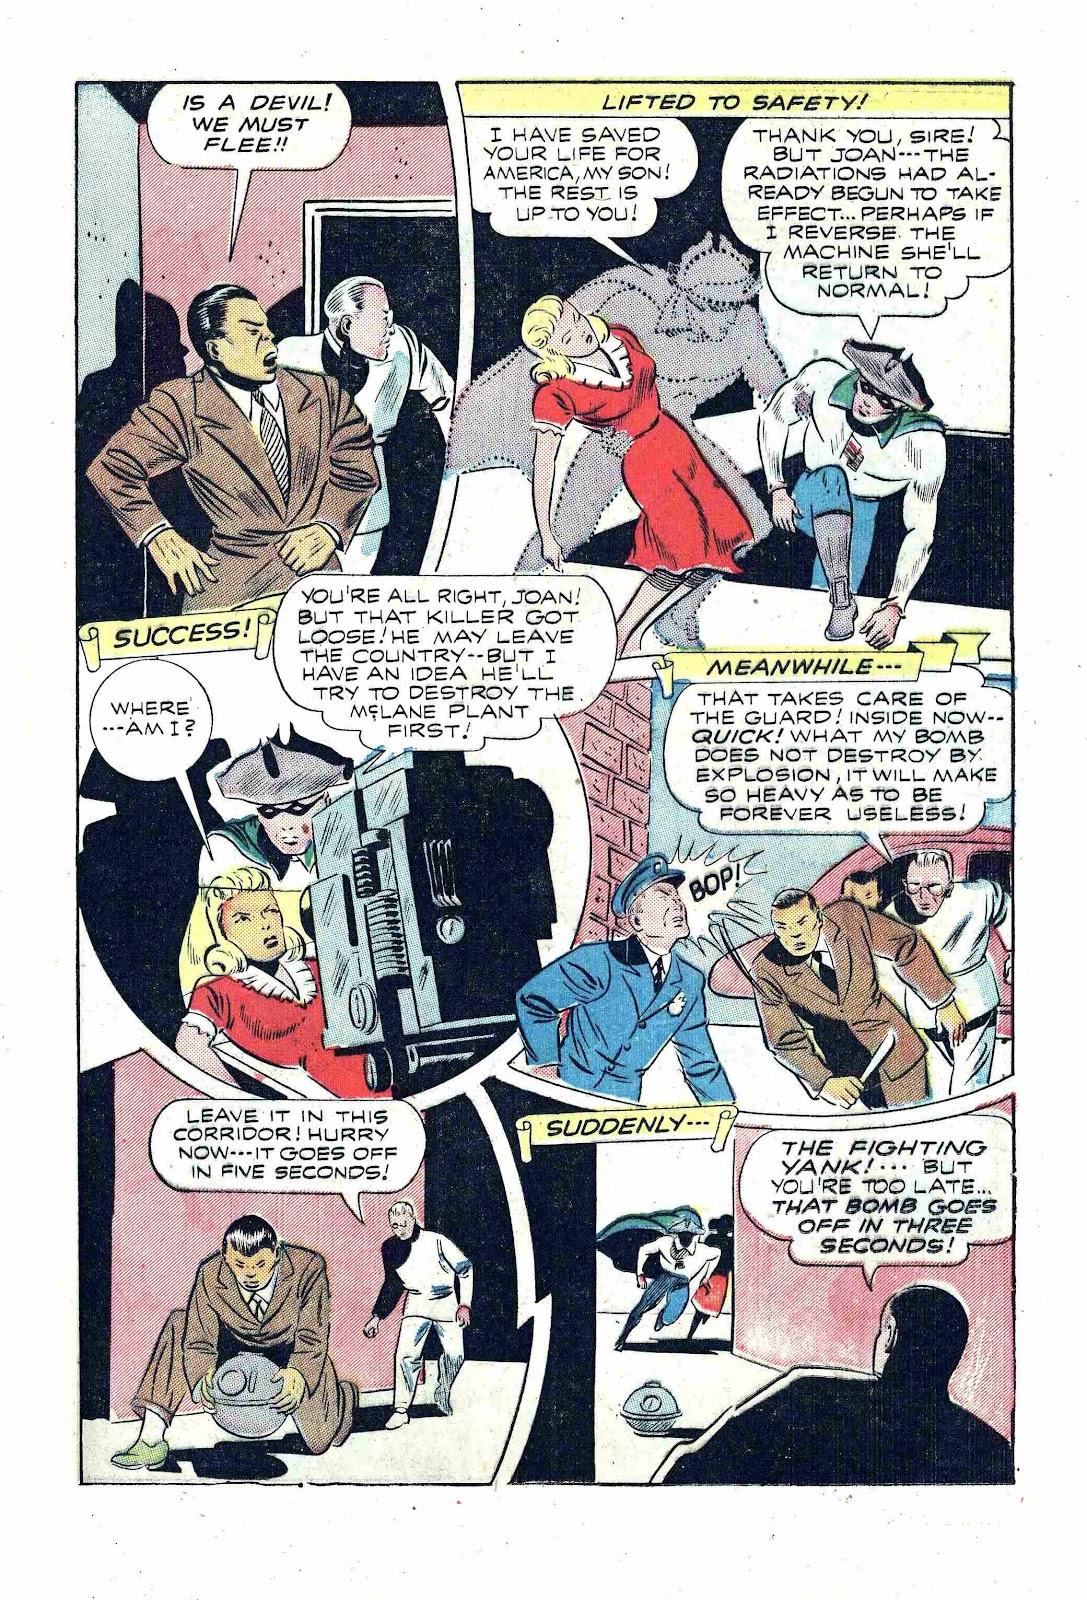 Read online America's Best Comics comic -  Issue #13 - 23